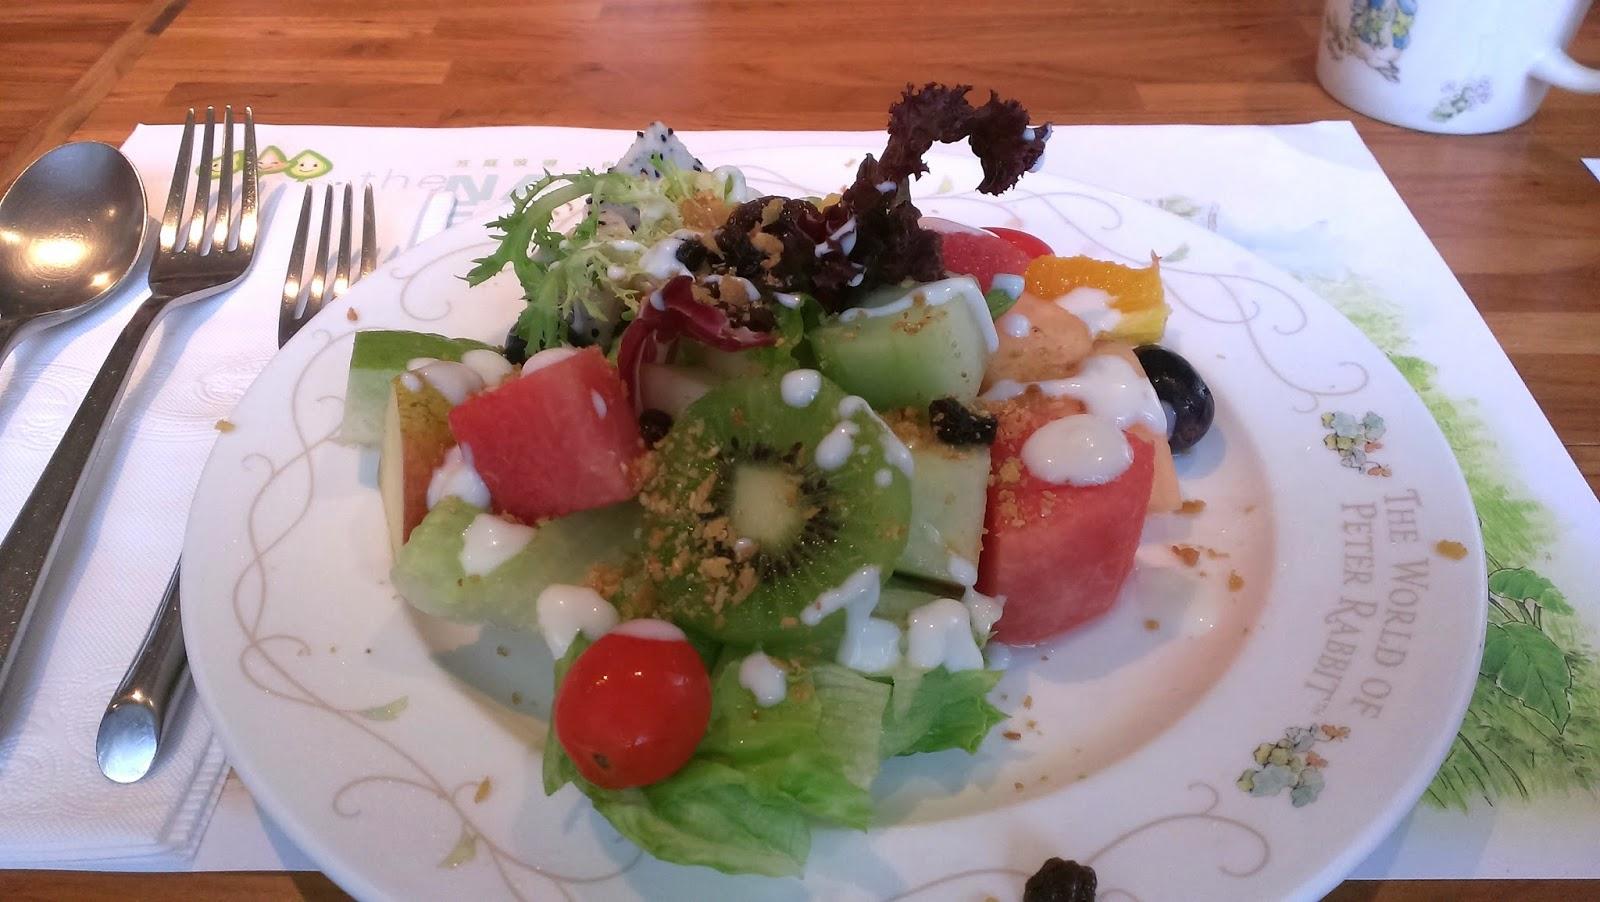 2014 09 08%2B12.41.55 - [食記] 芳庭彼得 - 義式創意無菜單料理,適合溫馨的小聚